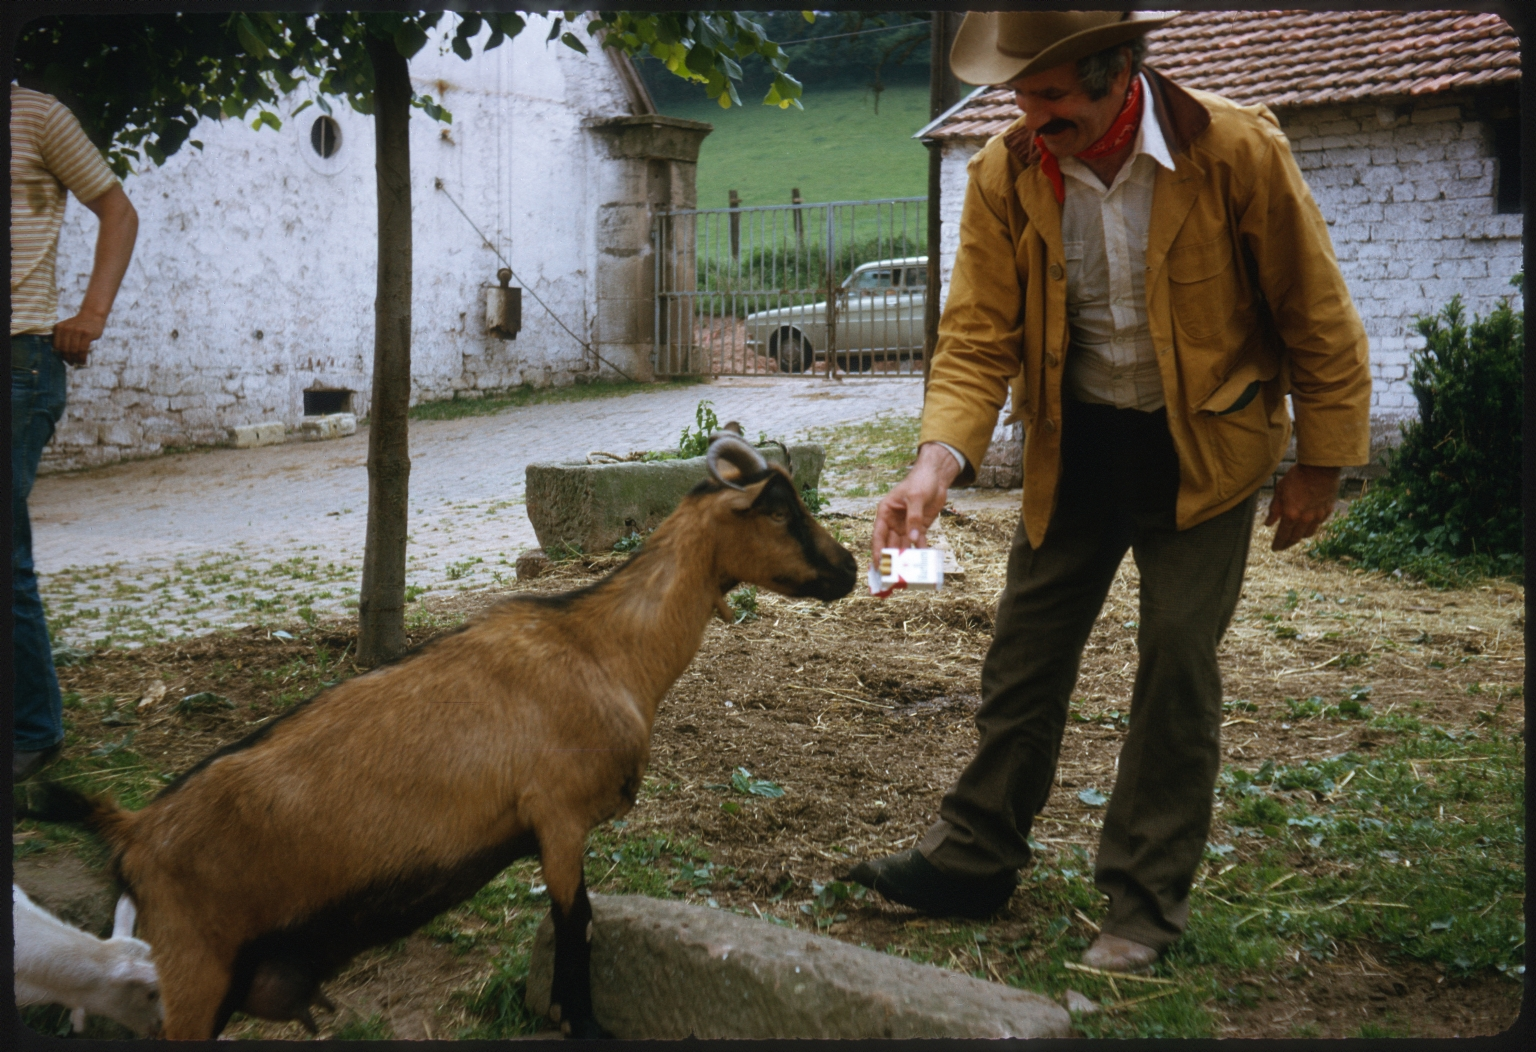 Goat asking for a cigarette